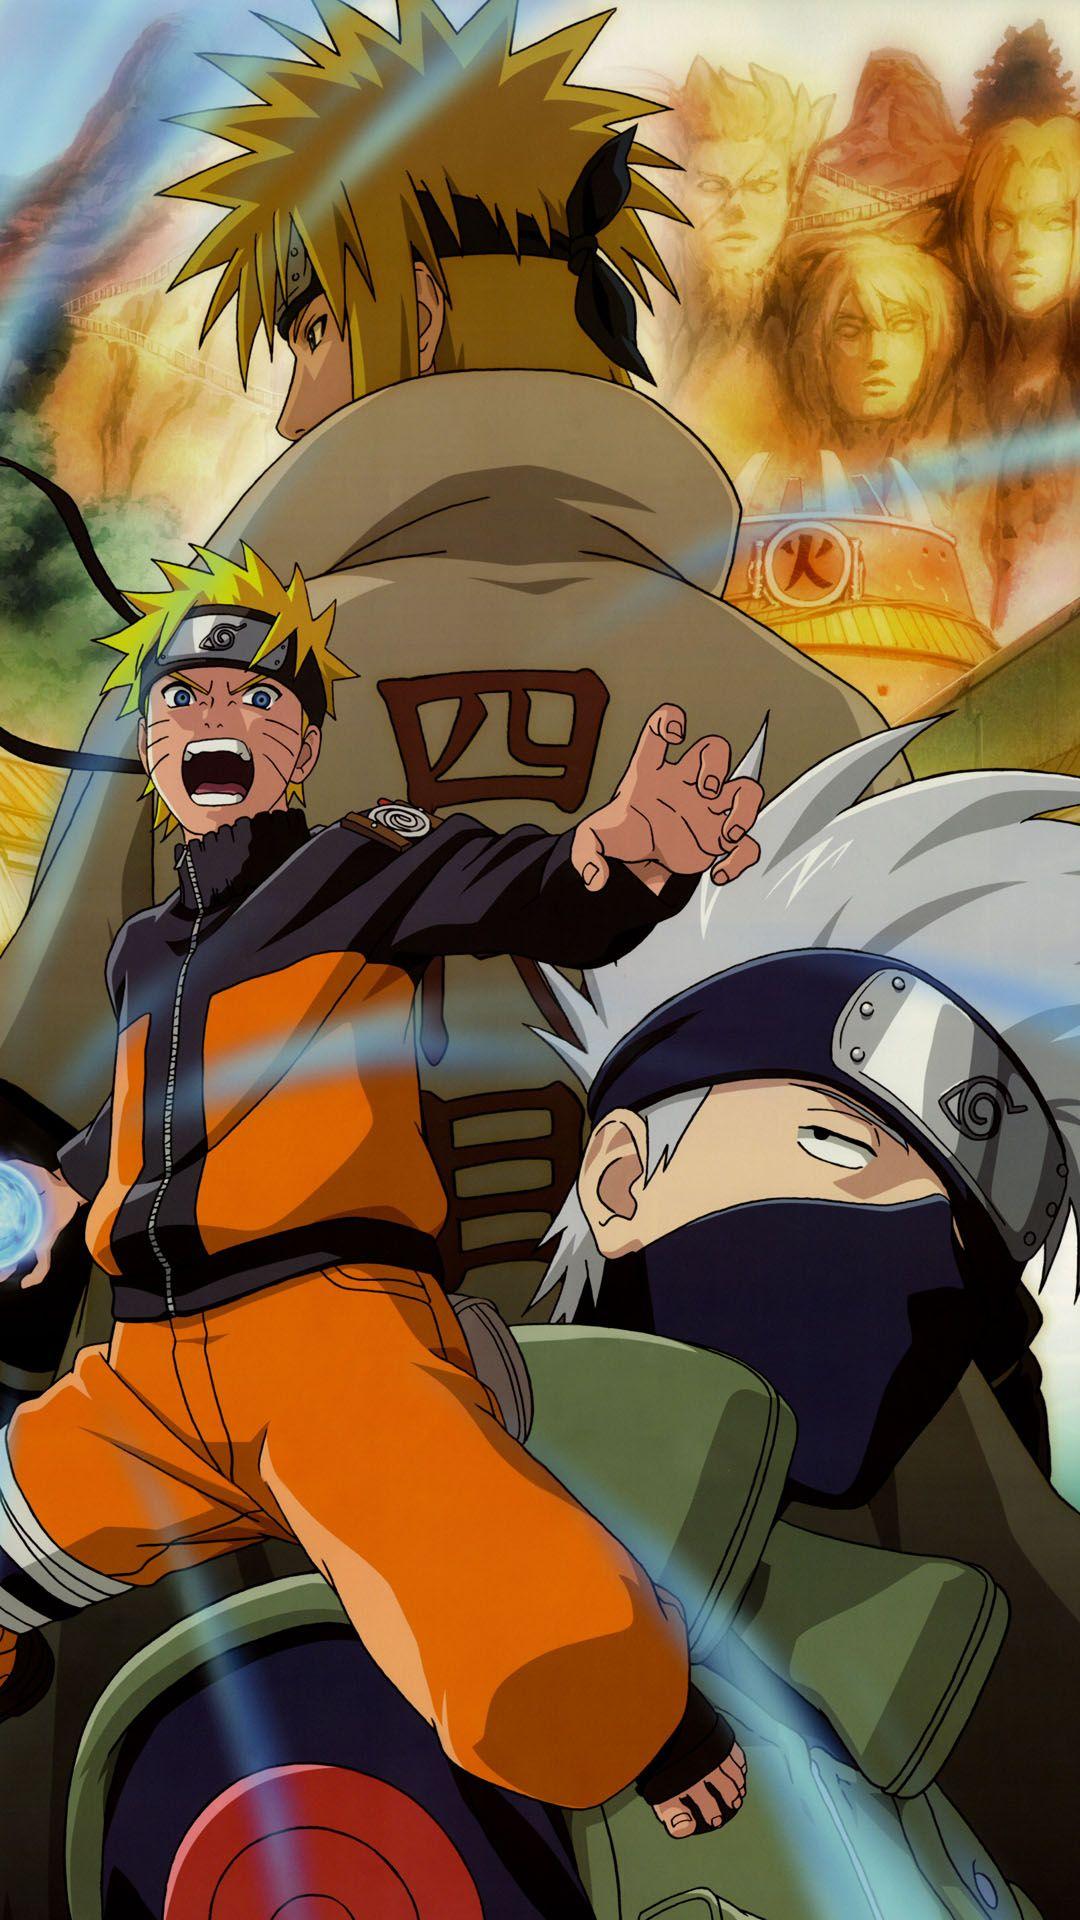 Hd Wallpaper And Background Photos Of Kakashi Hatake, Naruto And